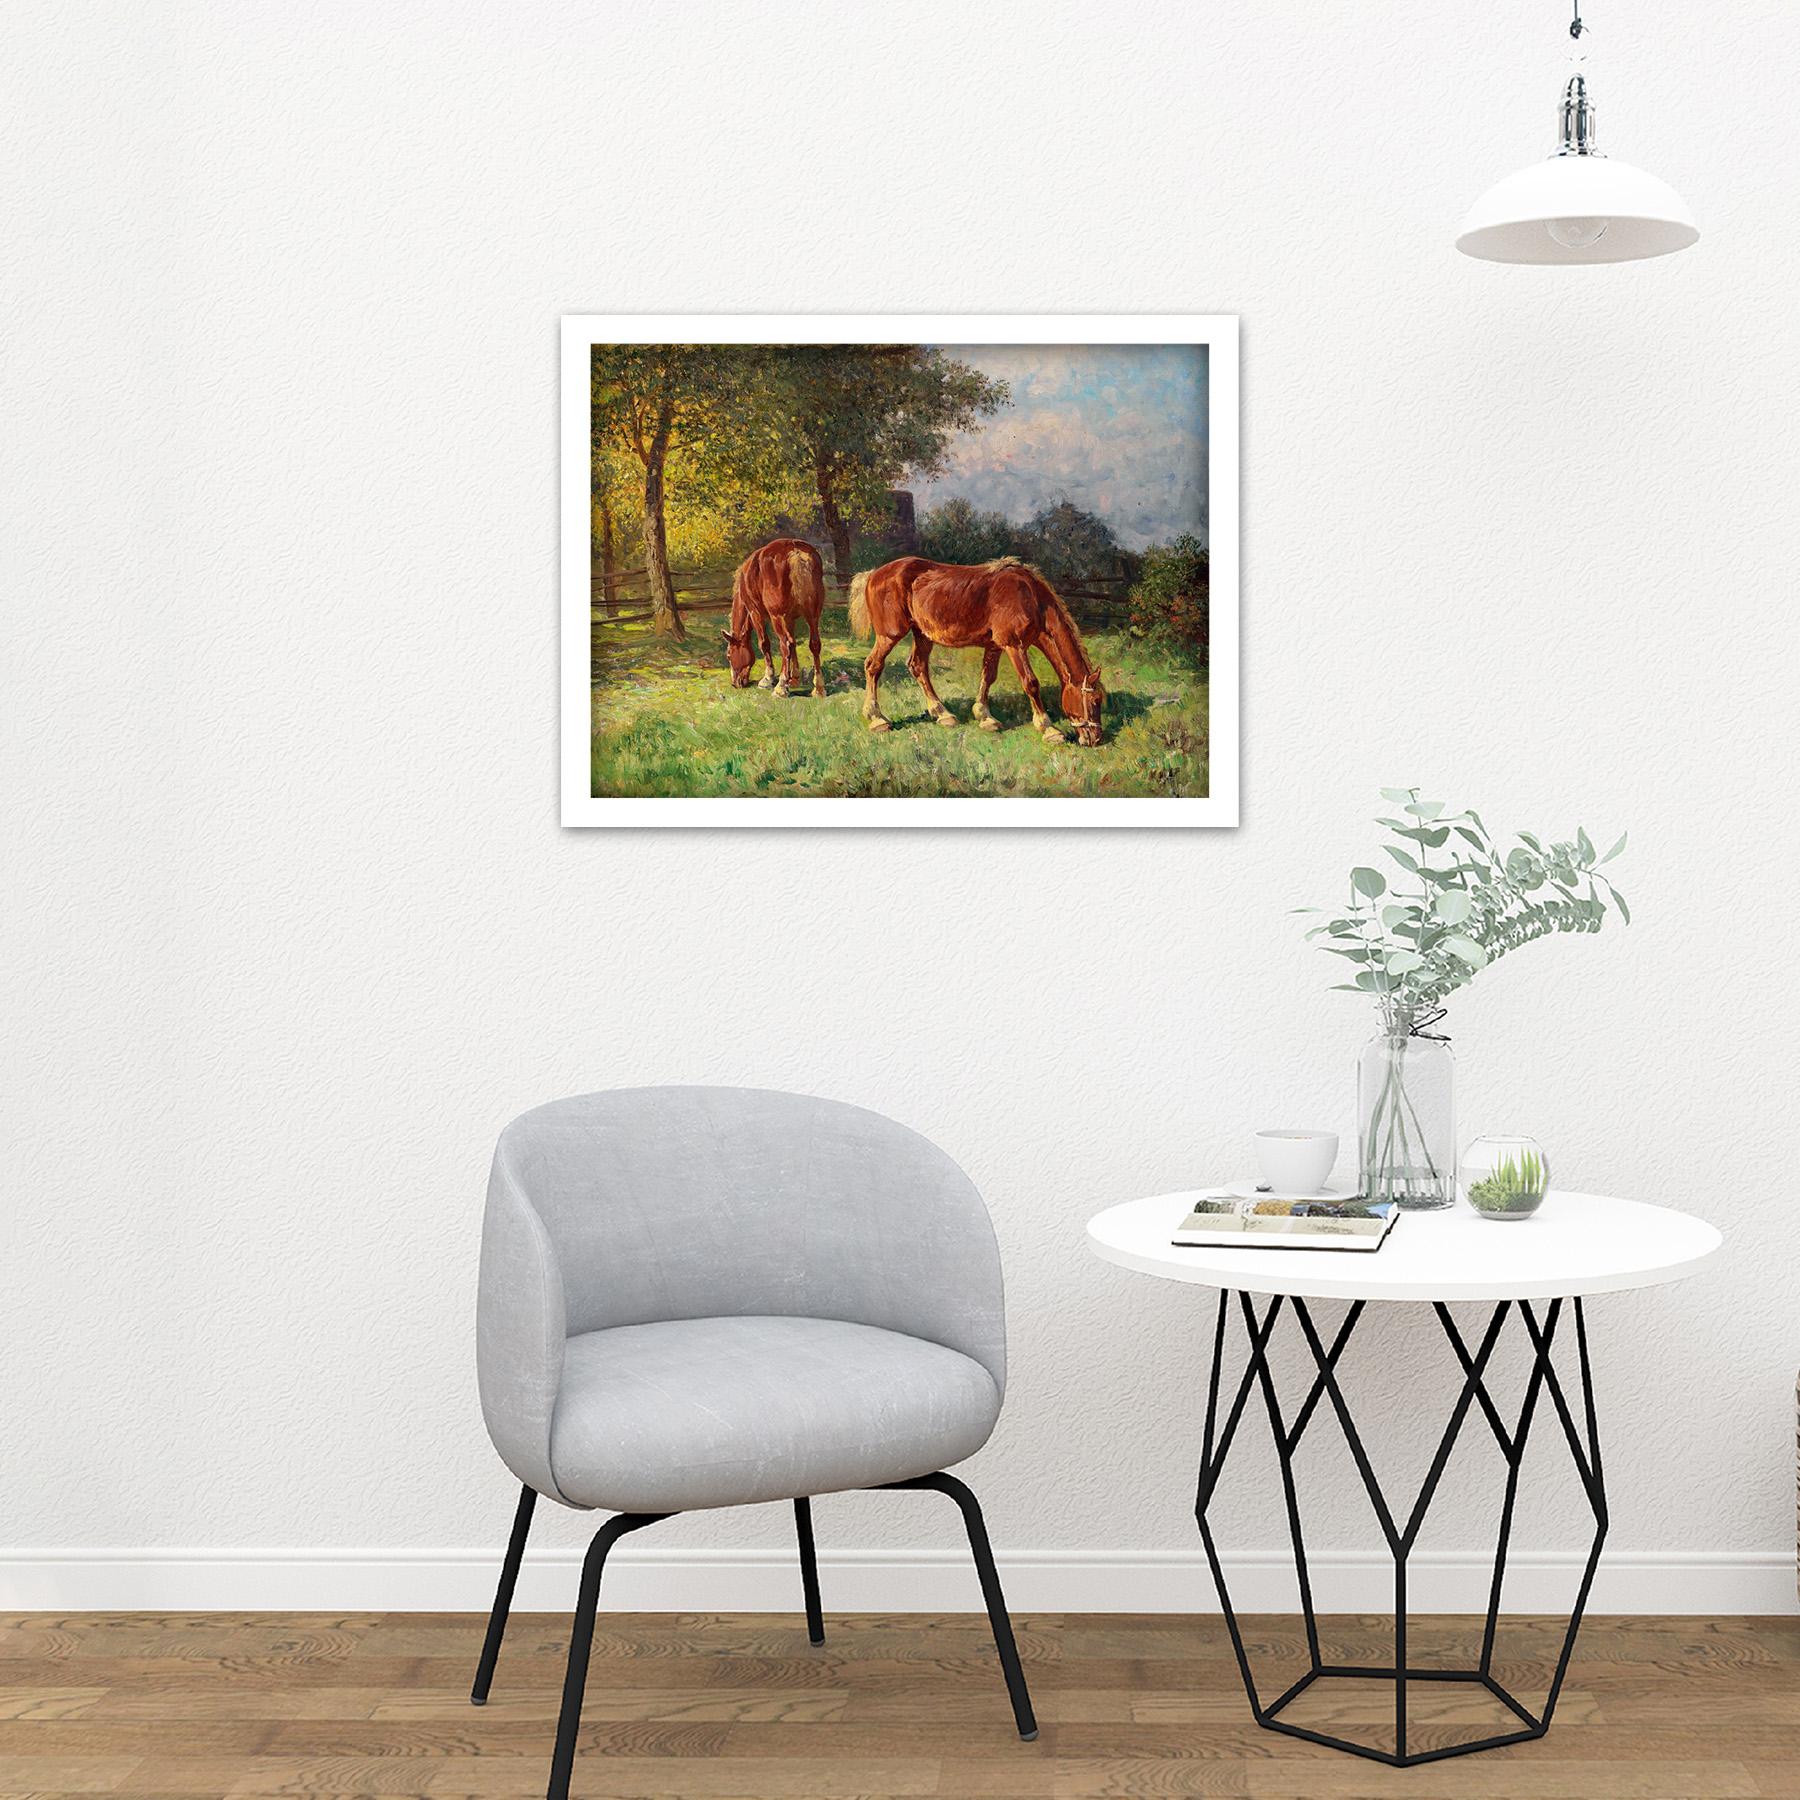 Van-Der-Venne-Horses-In-Pasture-Painting-Large-Framed-Art-Print thumbnail 23